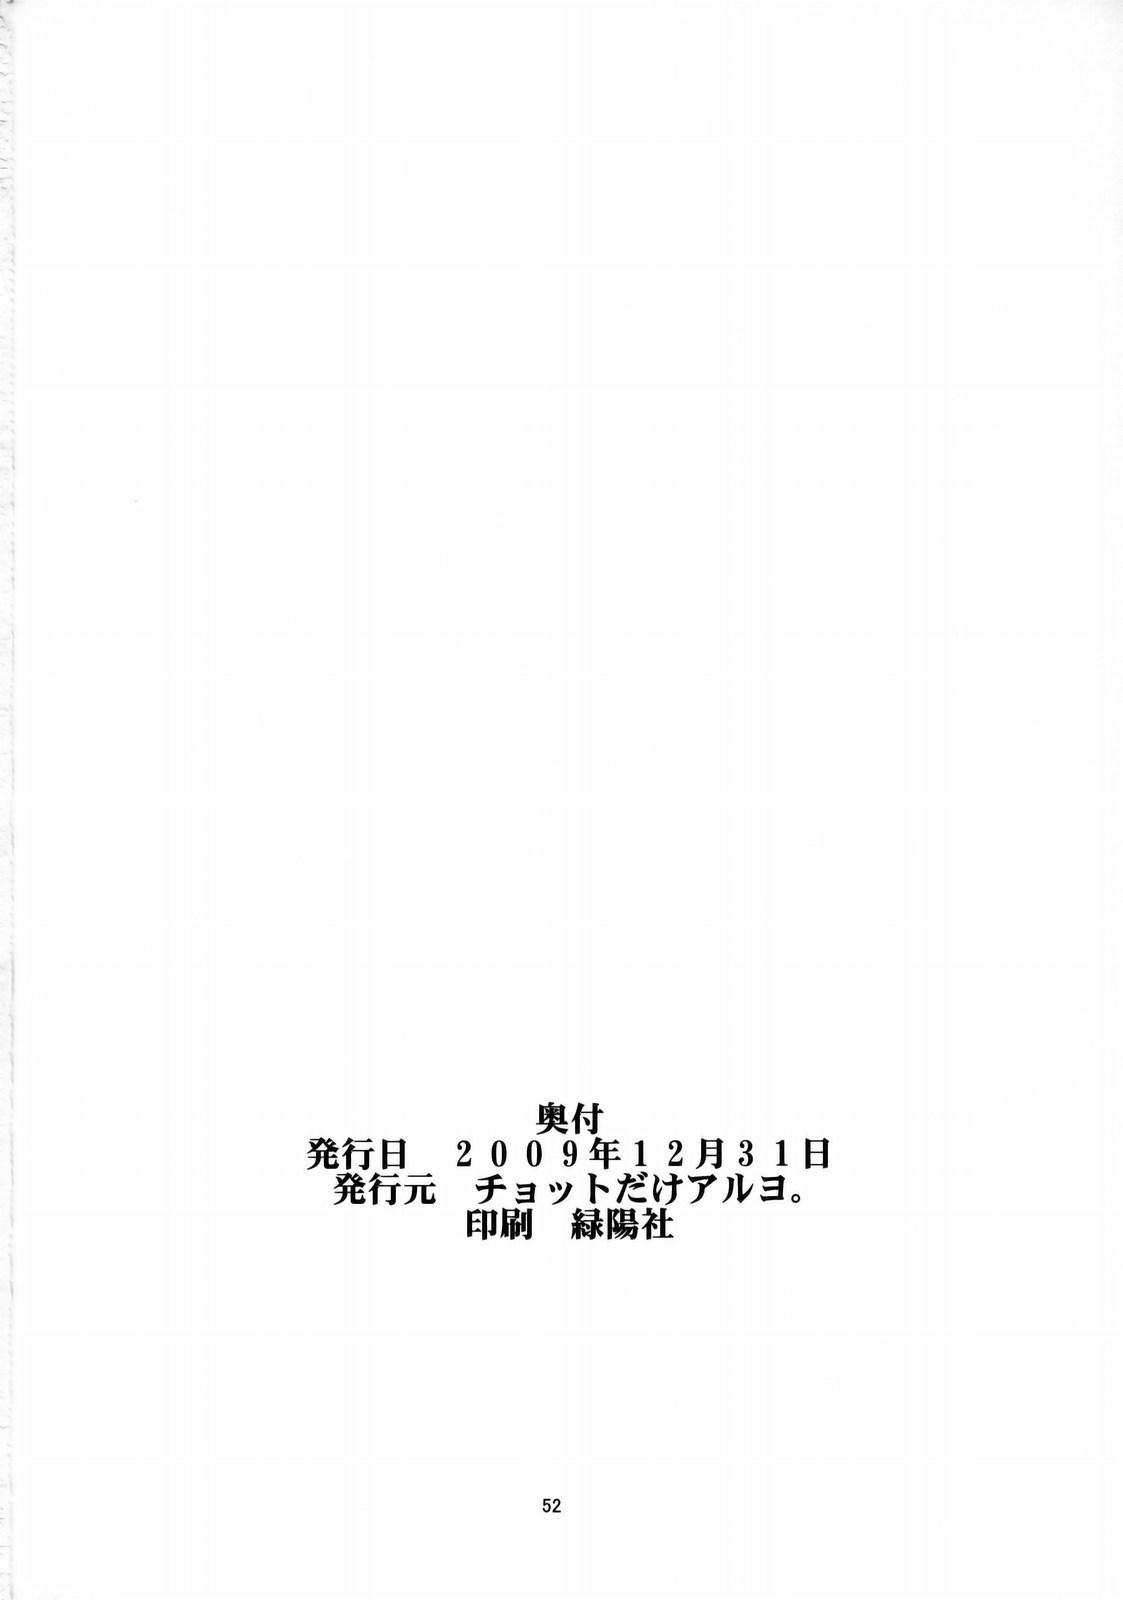 Haruka to Chihaya to Producer 52